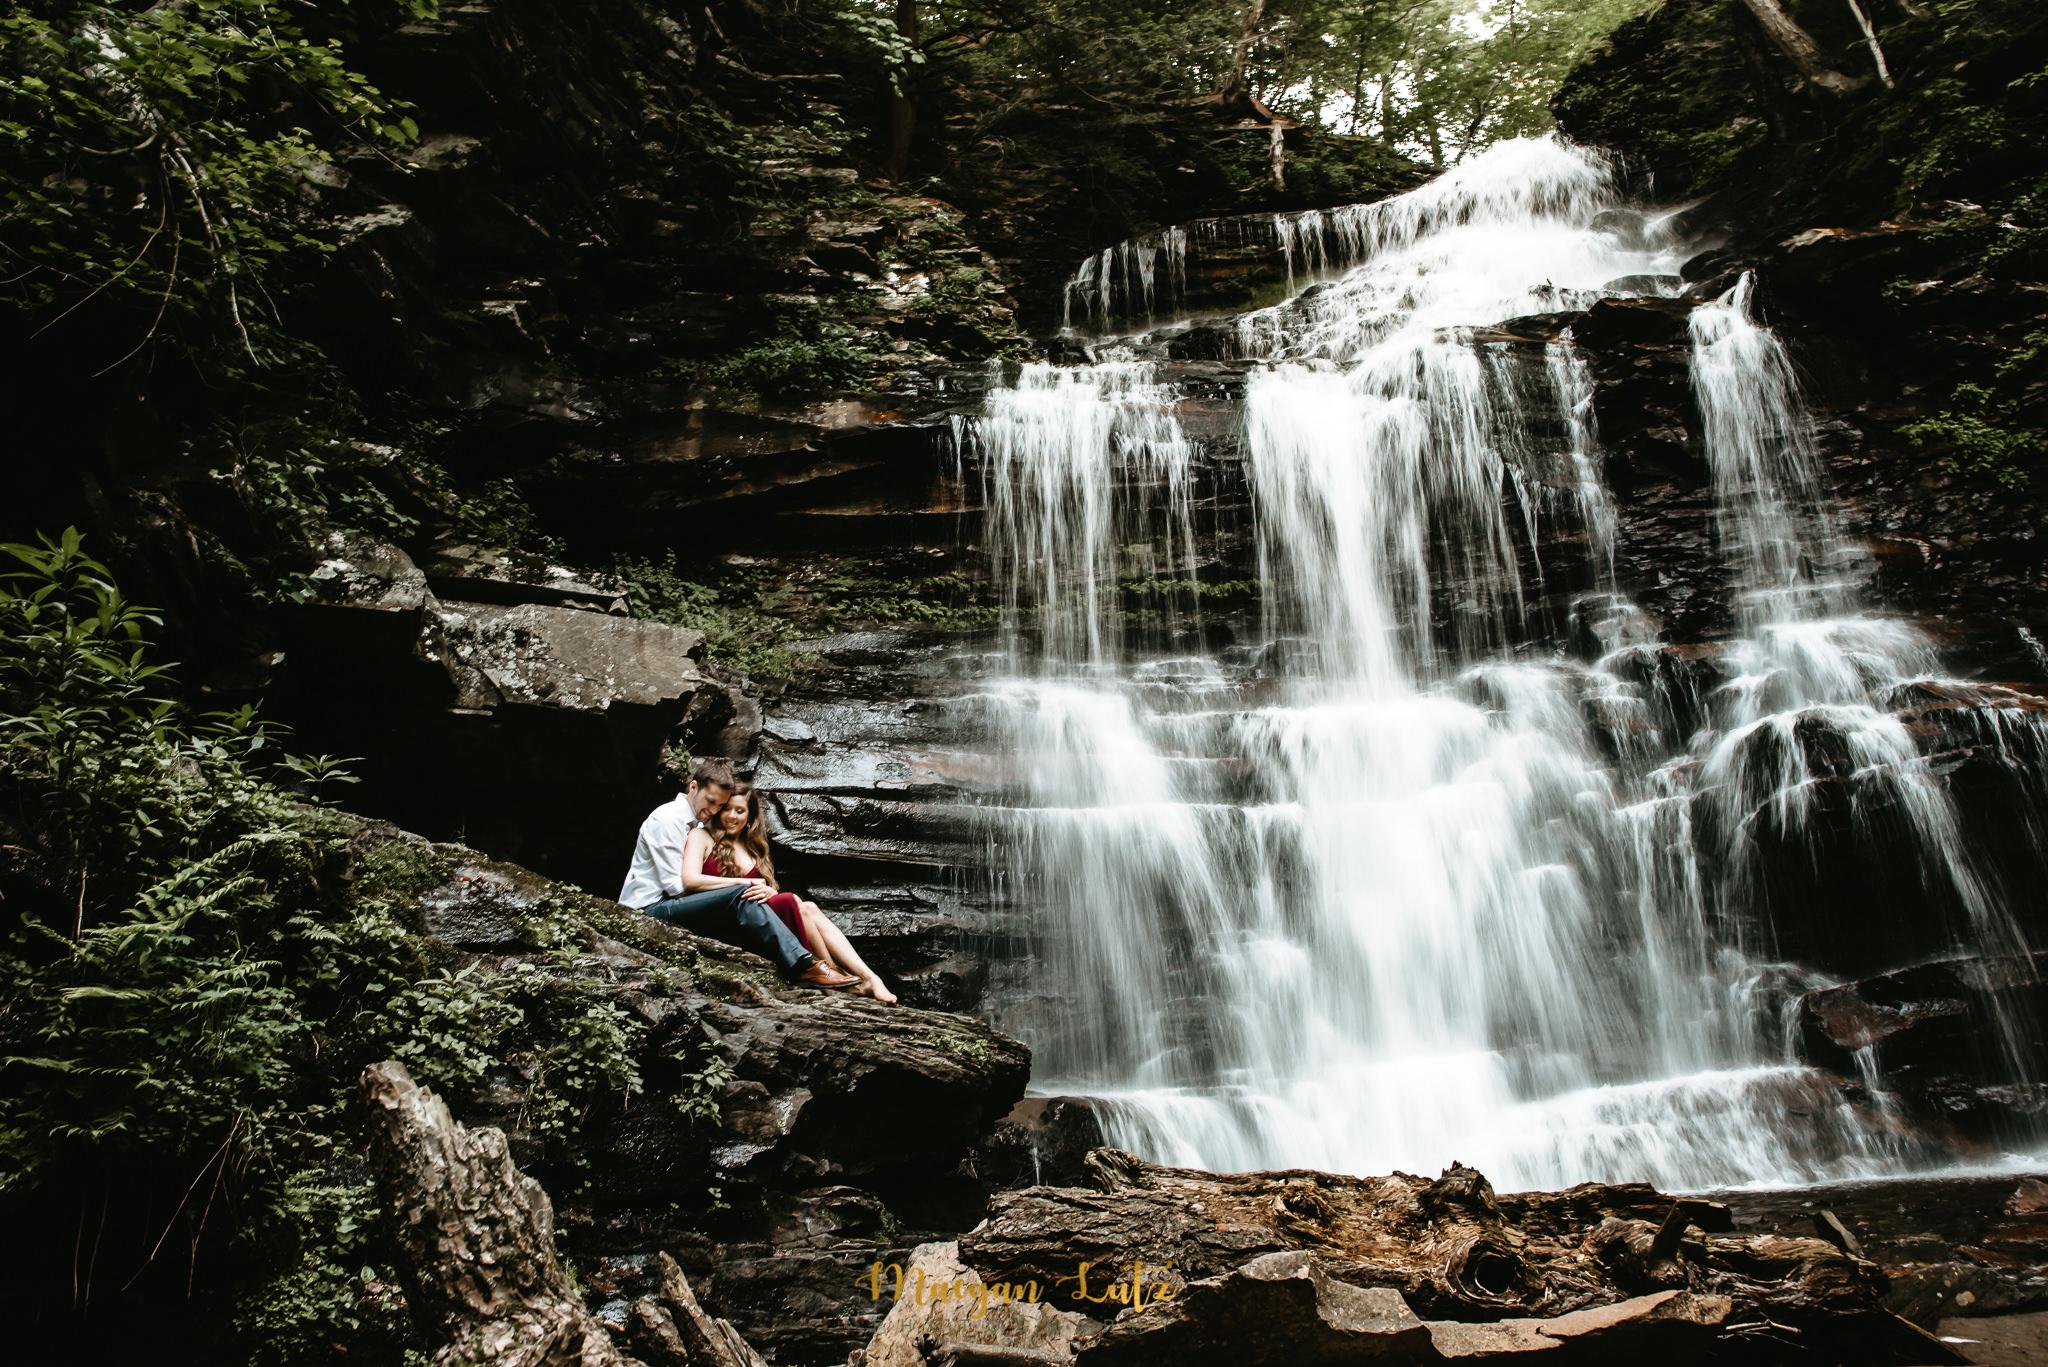 NEPA-Engagement-Wedding-Photographer-Session-at-Ricketts-Glen-State-Park-3.jpg